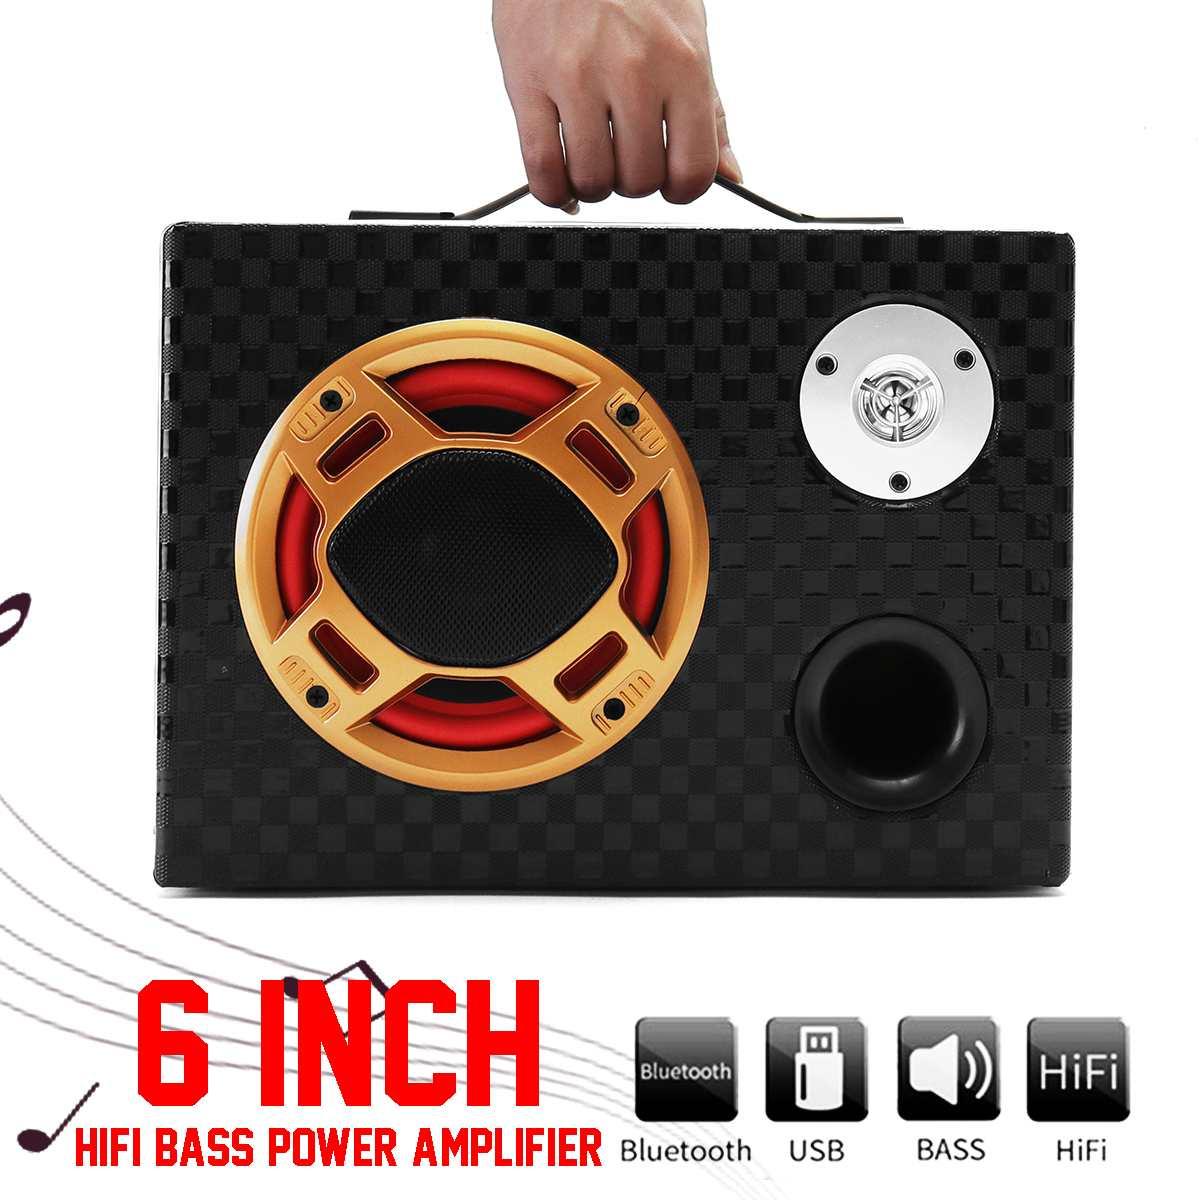 500W 12v/24V 220v 6 Car Hifi Amplifier Speaker Auto Audio Bass Power Bluetooth